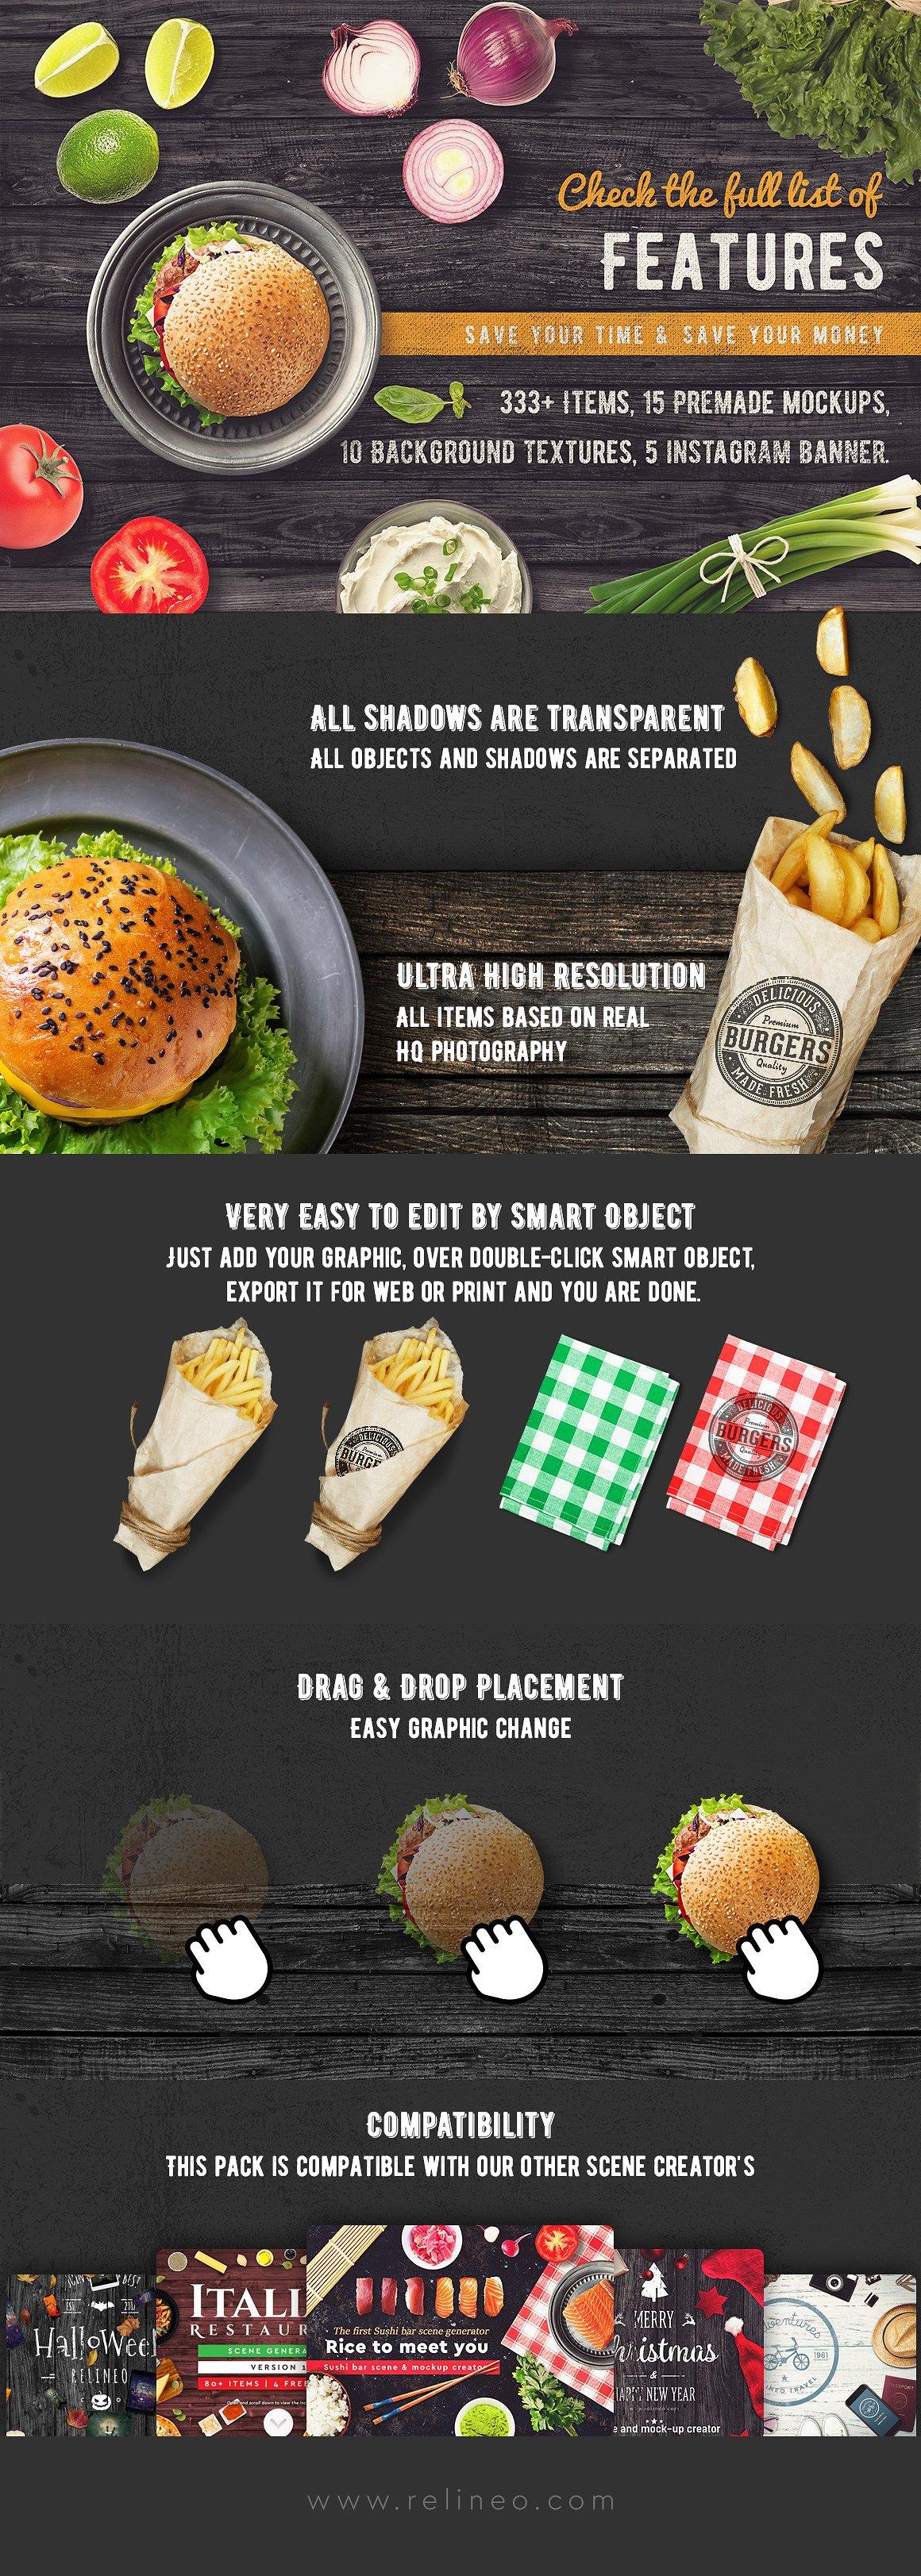 Burger Bar scene and mock-up generator